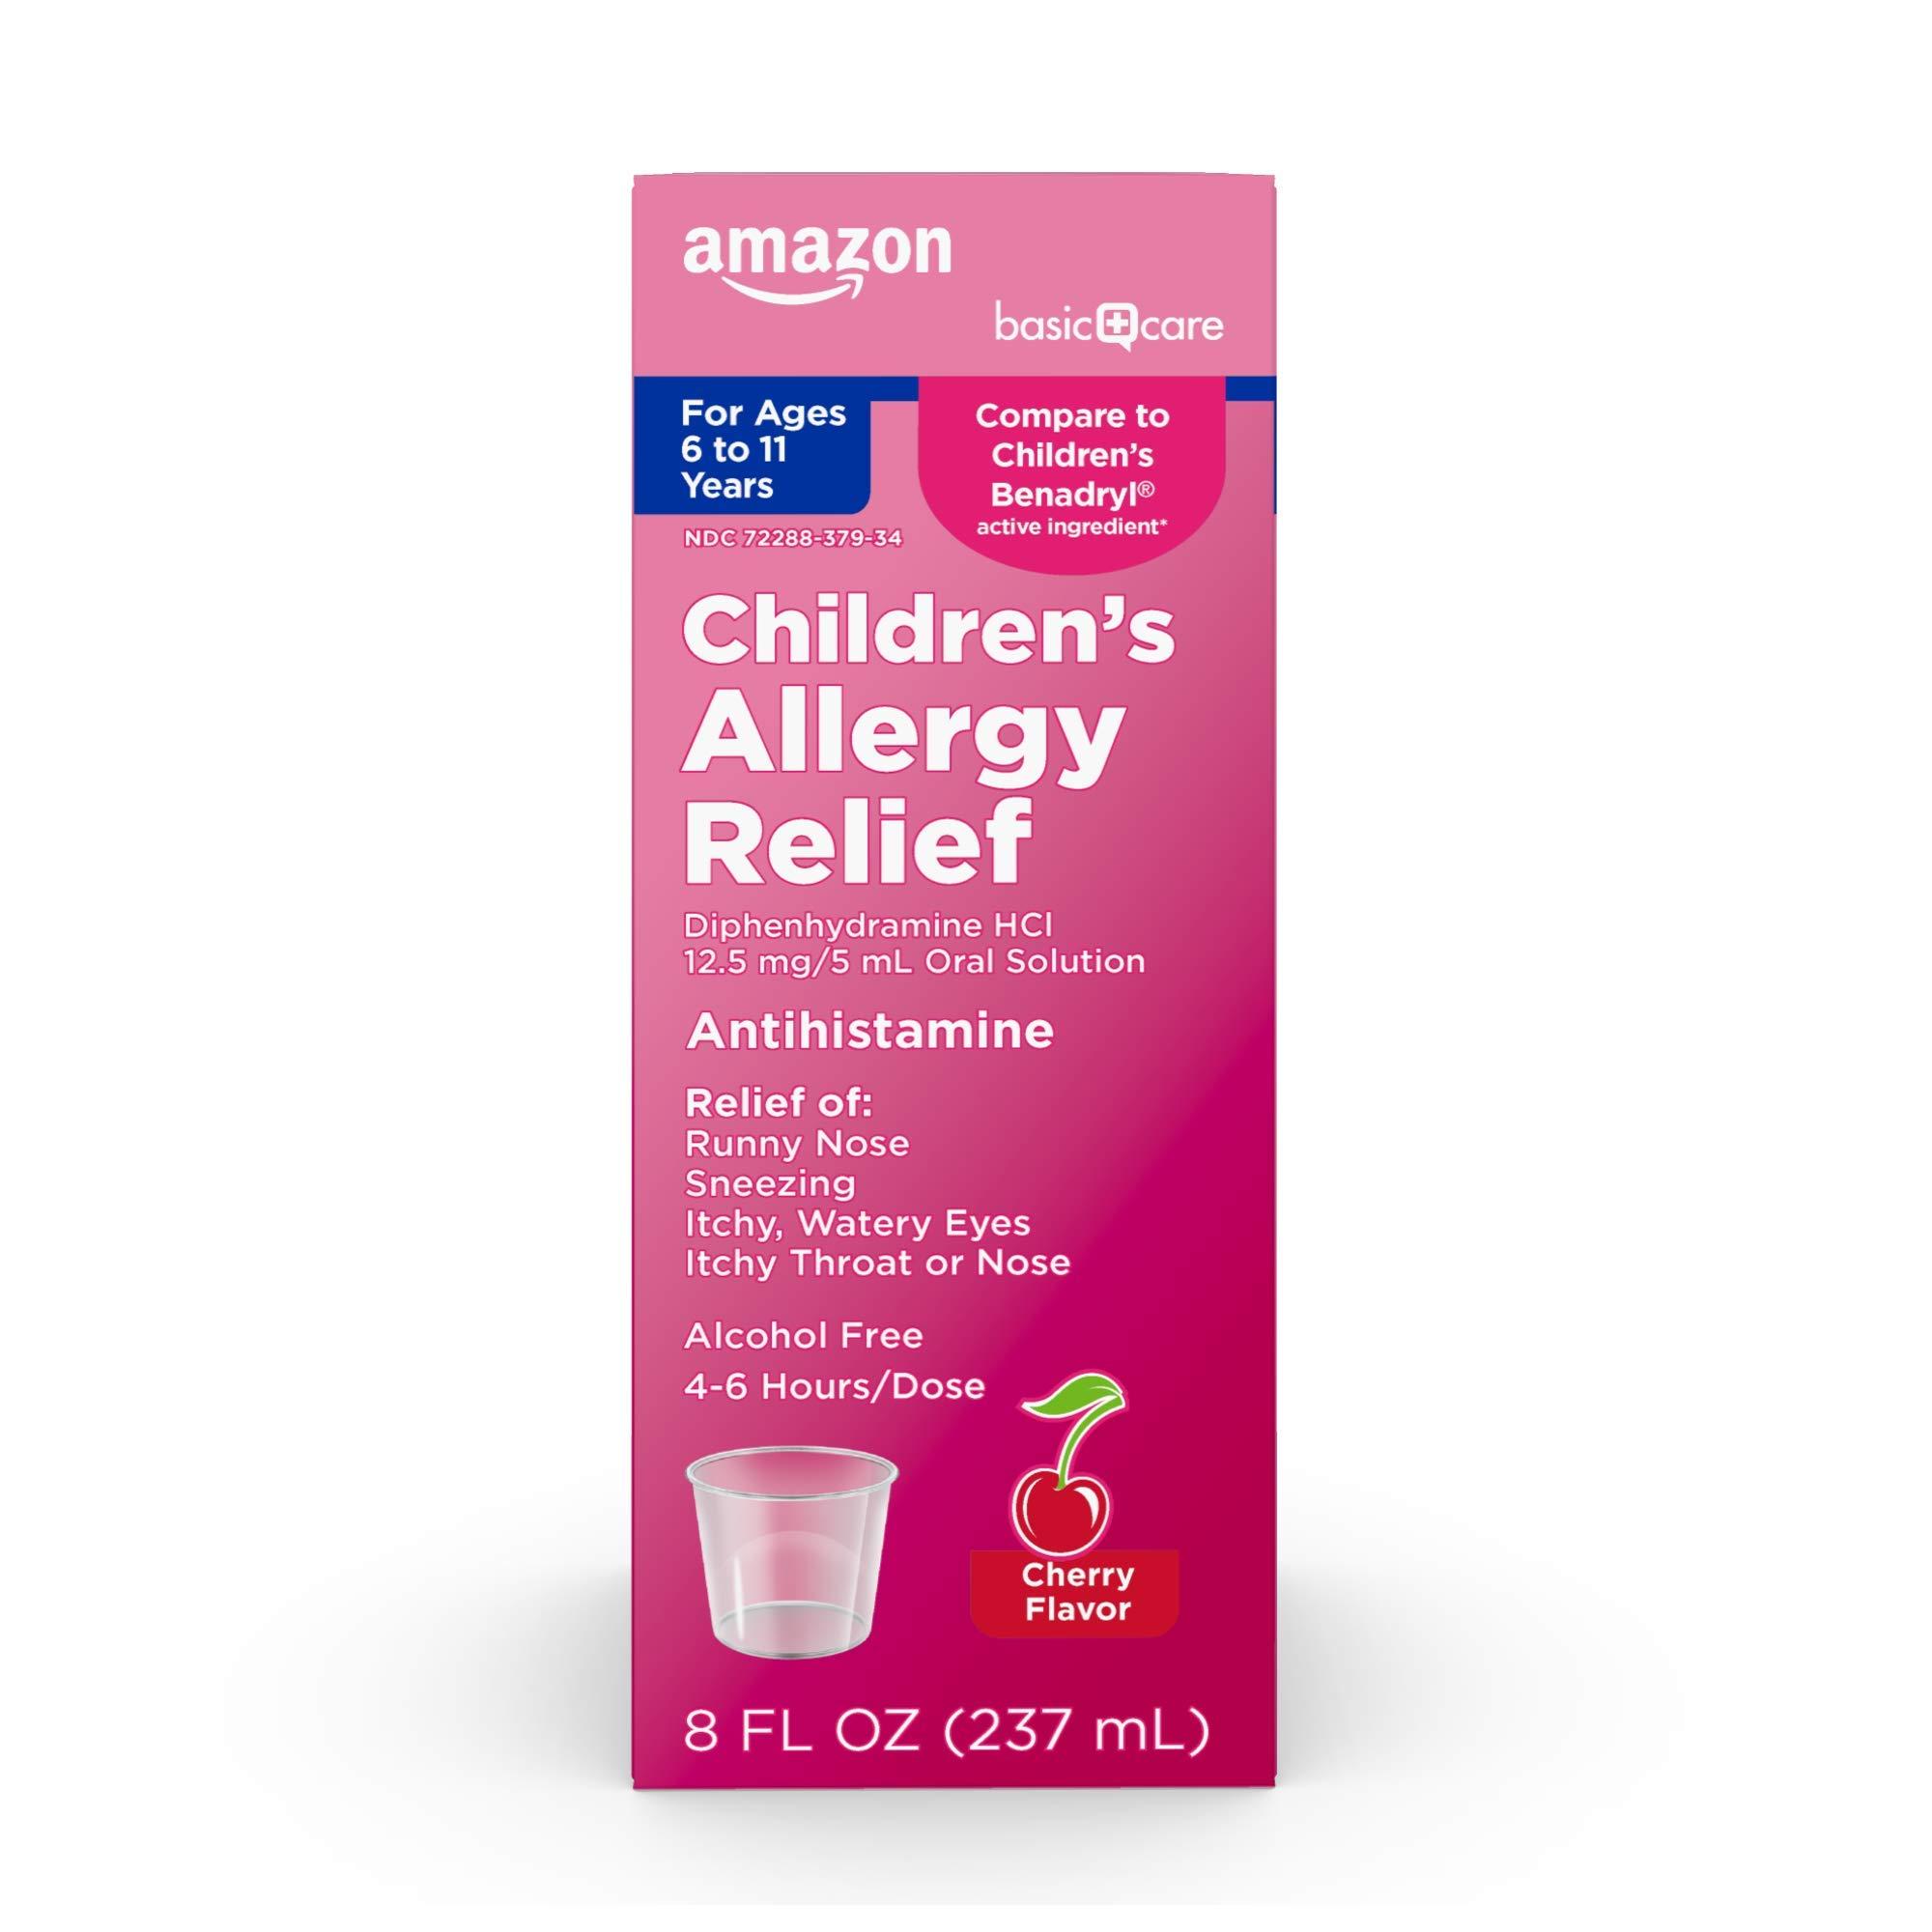 Amazon Basic Care Children's Allergy Relief, Pink, Cherry, 8 Fl Oz